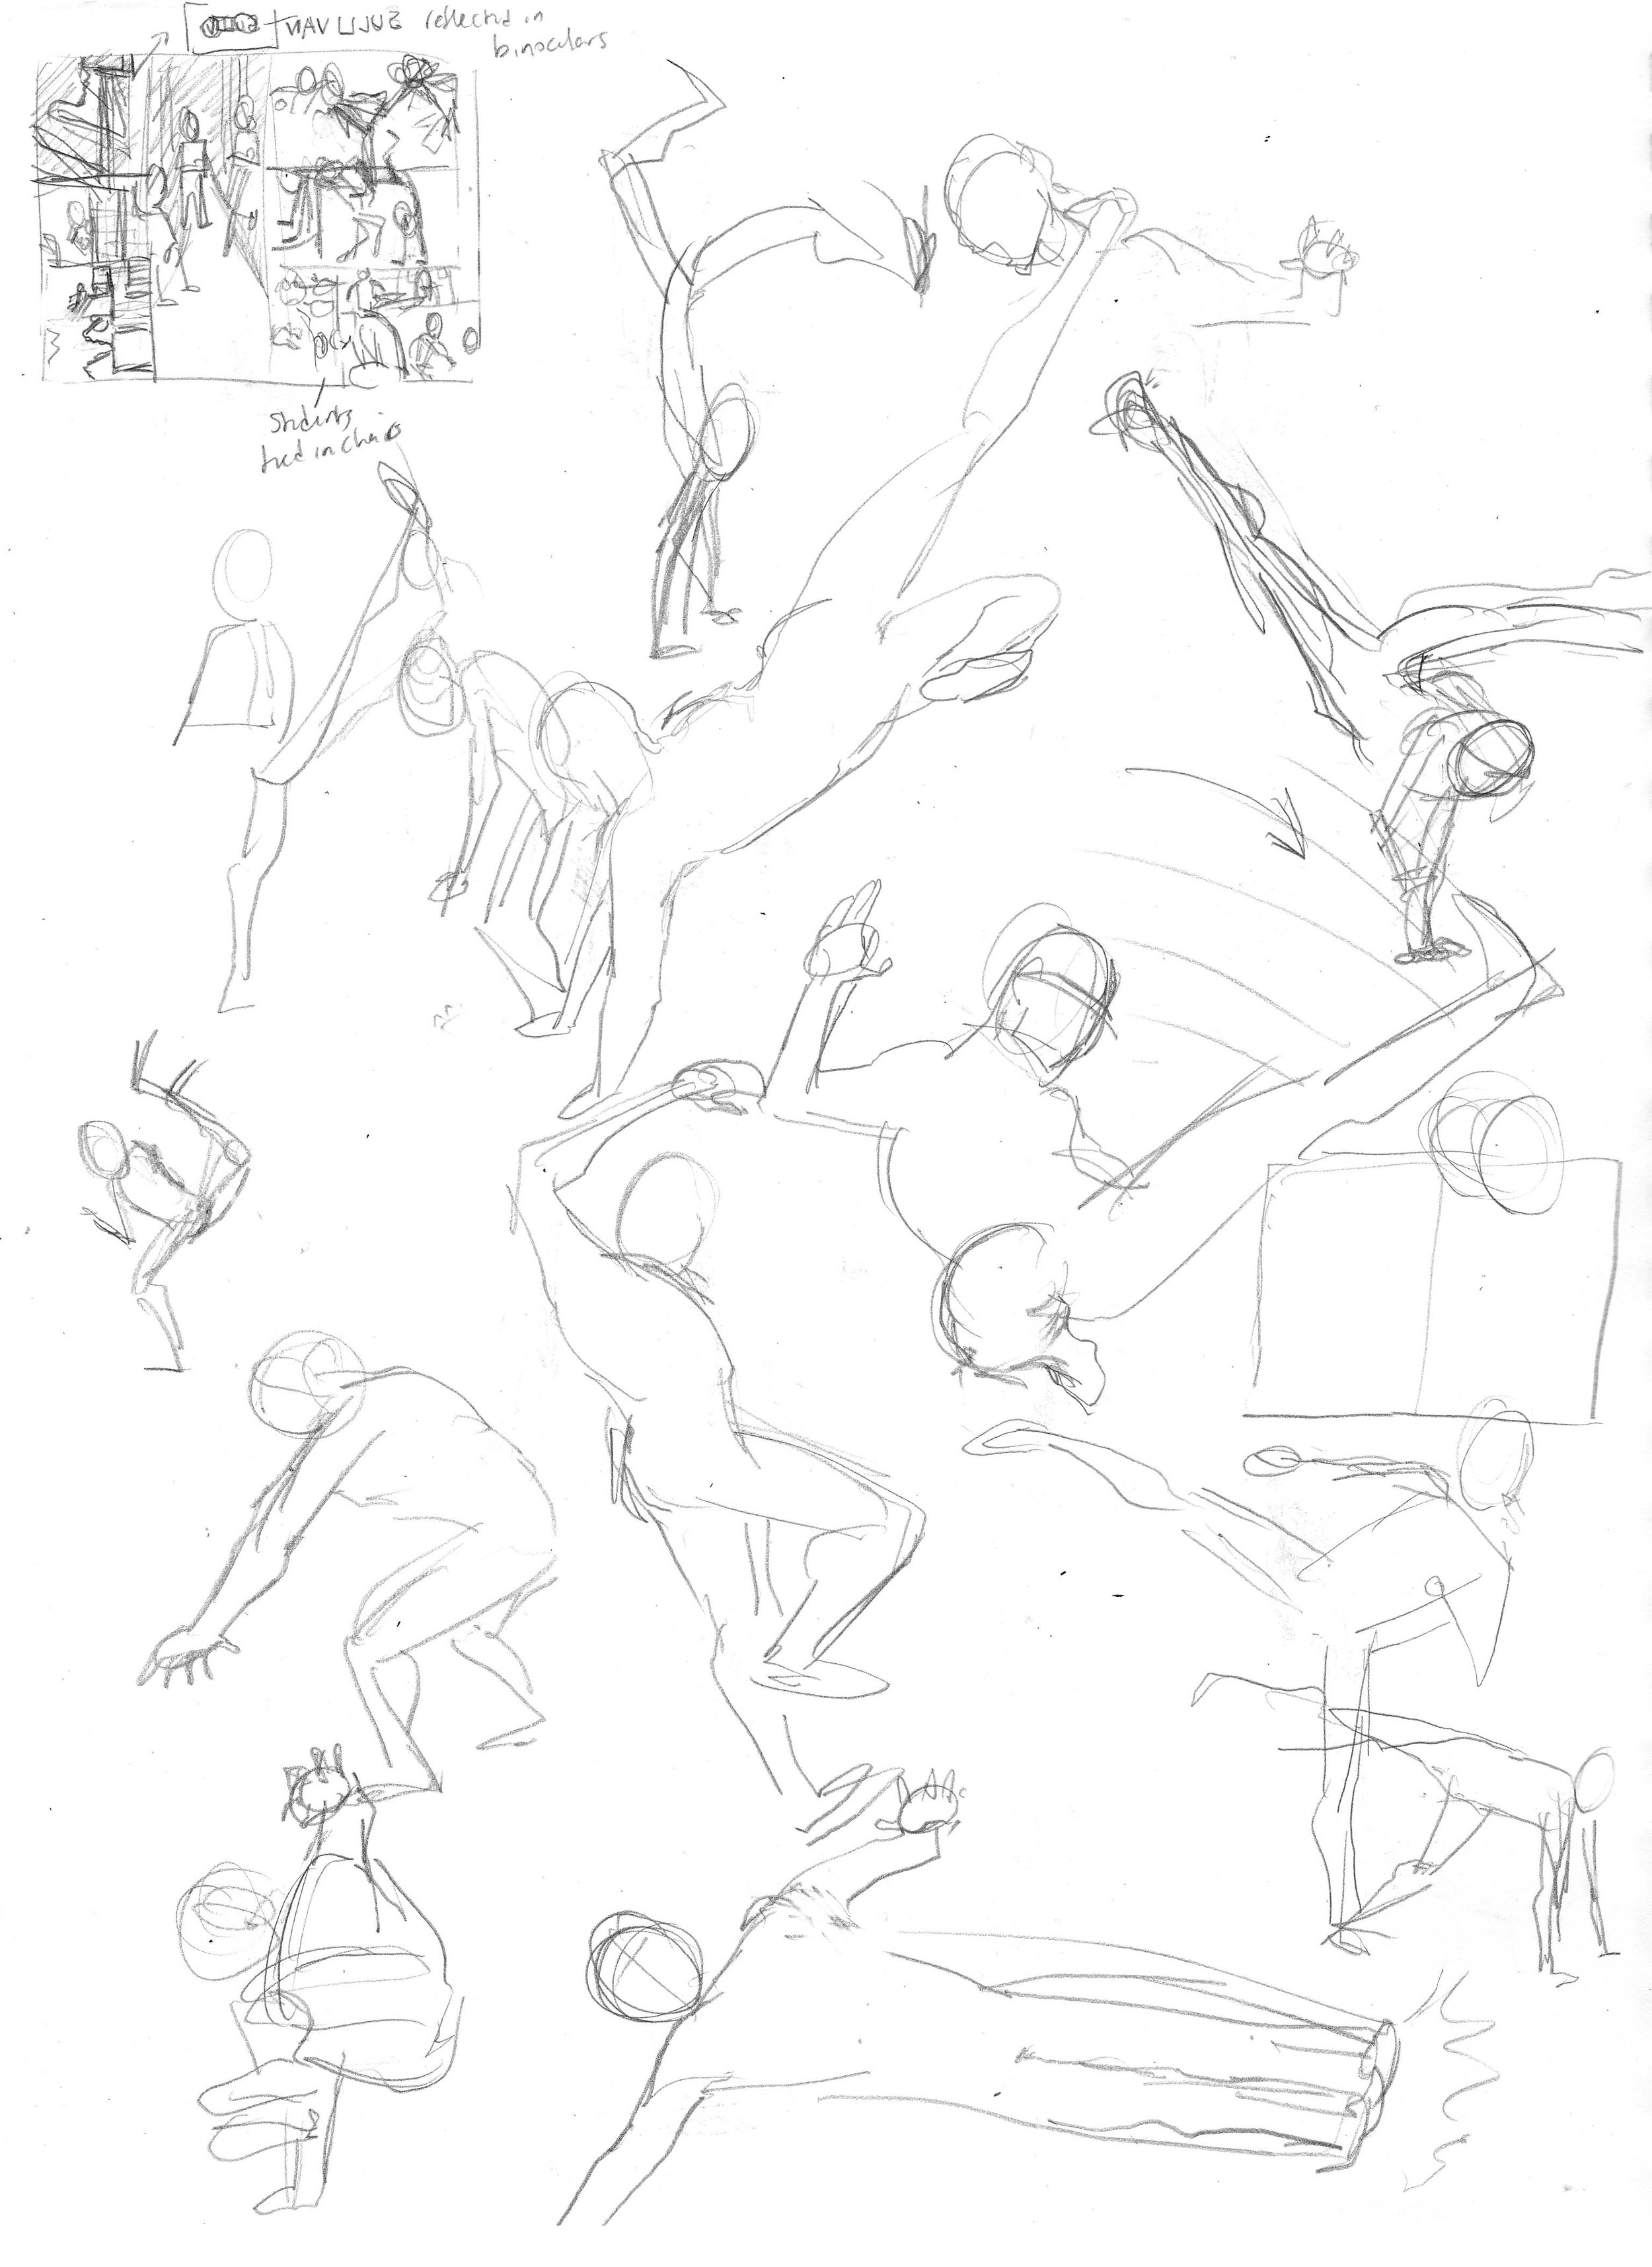 hunter haute_thumbnails sketch 2.jpg